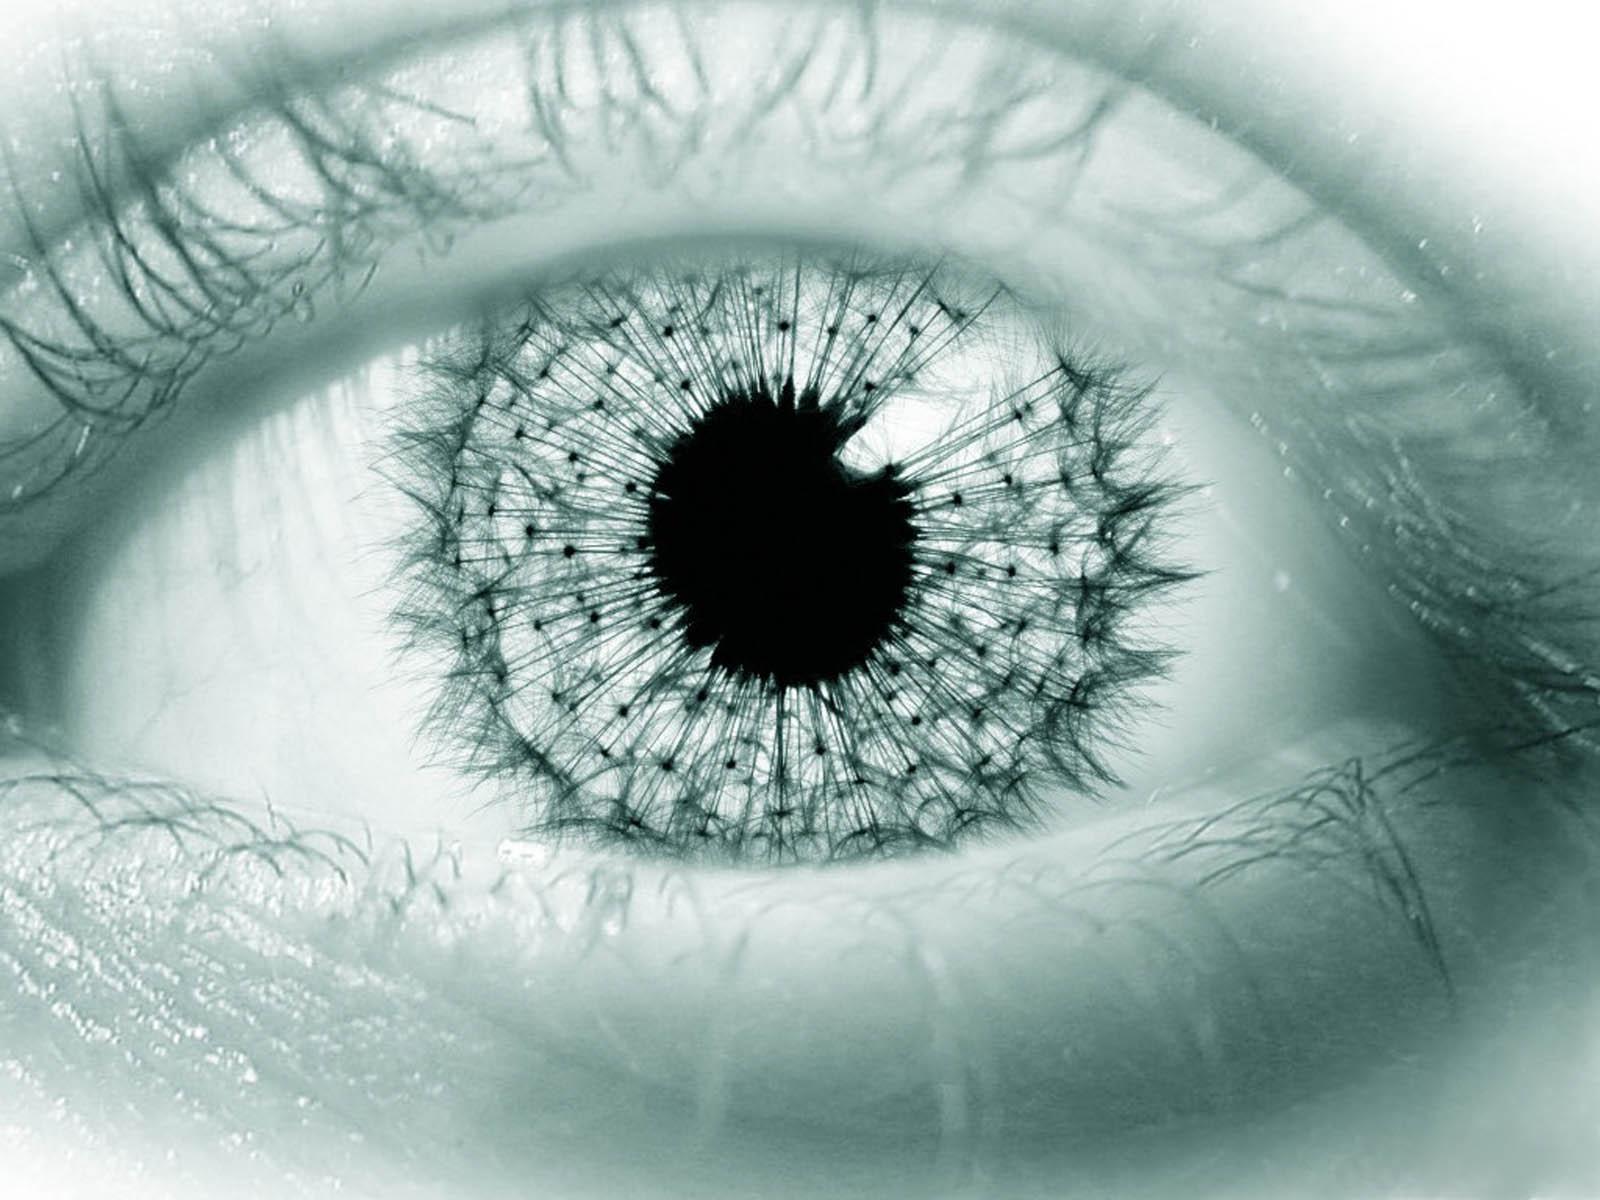 wallpaper 3D Eye Wallpapers